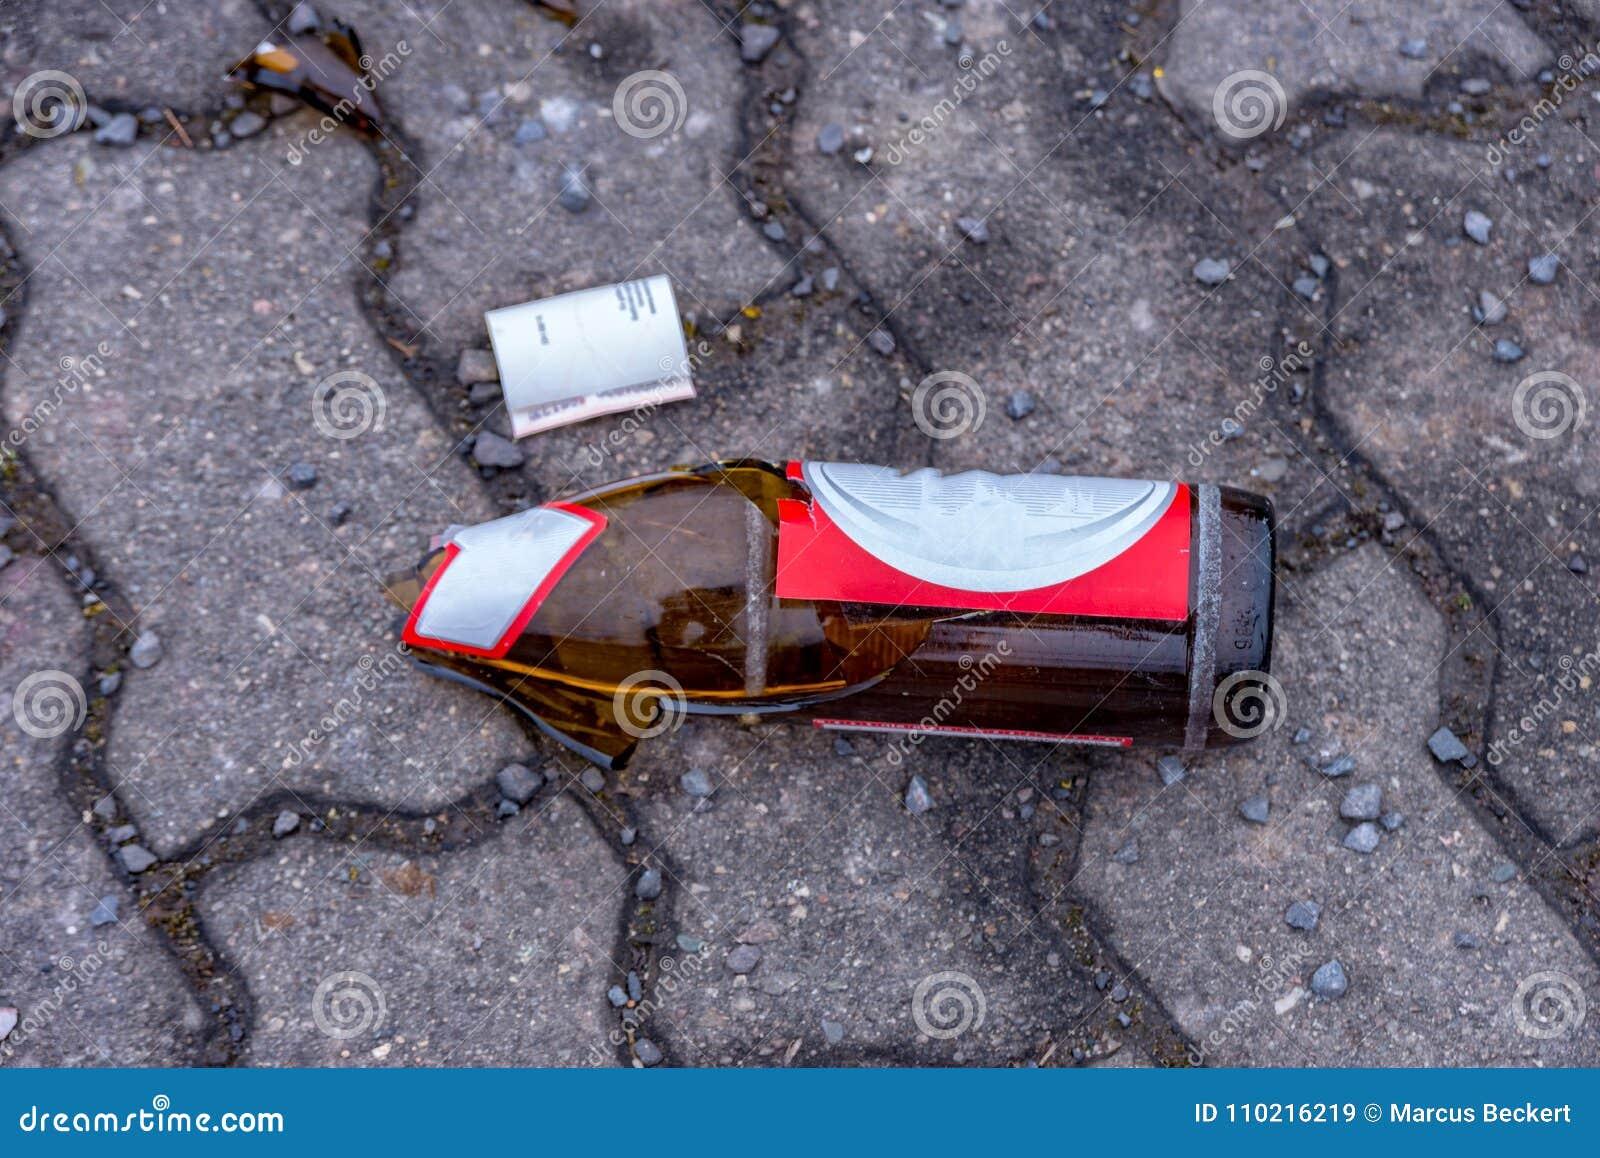 Broken beer bottles in the middle of the footpath